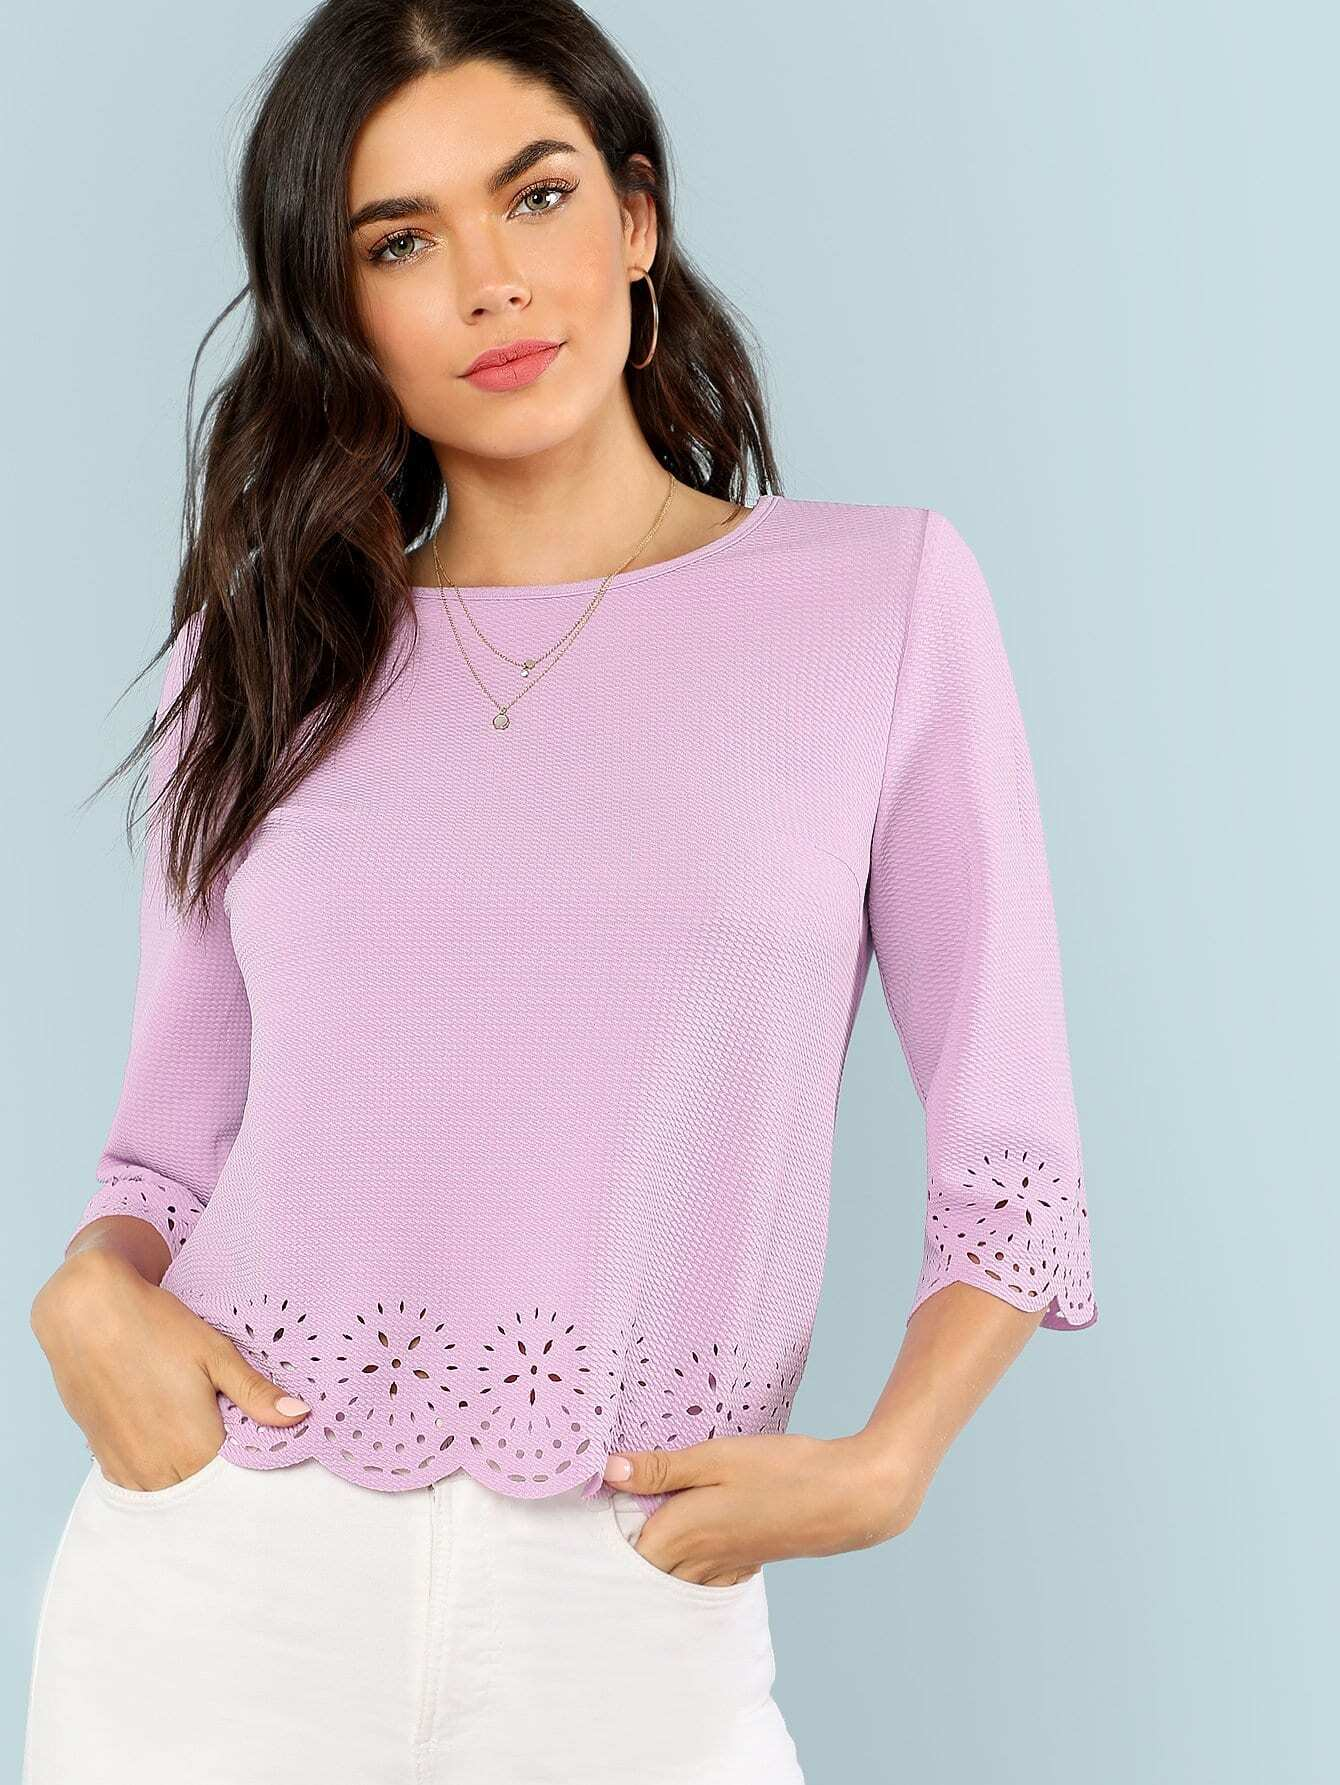 Scallop Laser Cut Textured Blouse scallop laser cut textured blouse